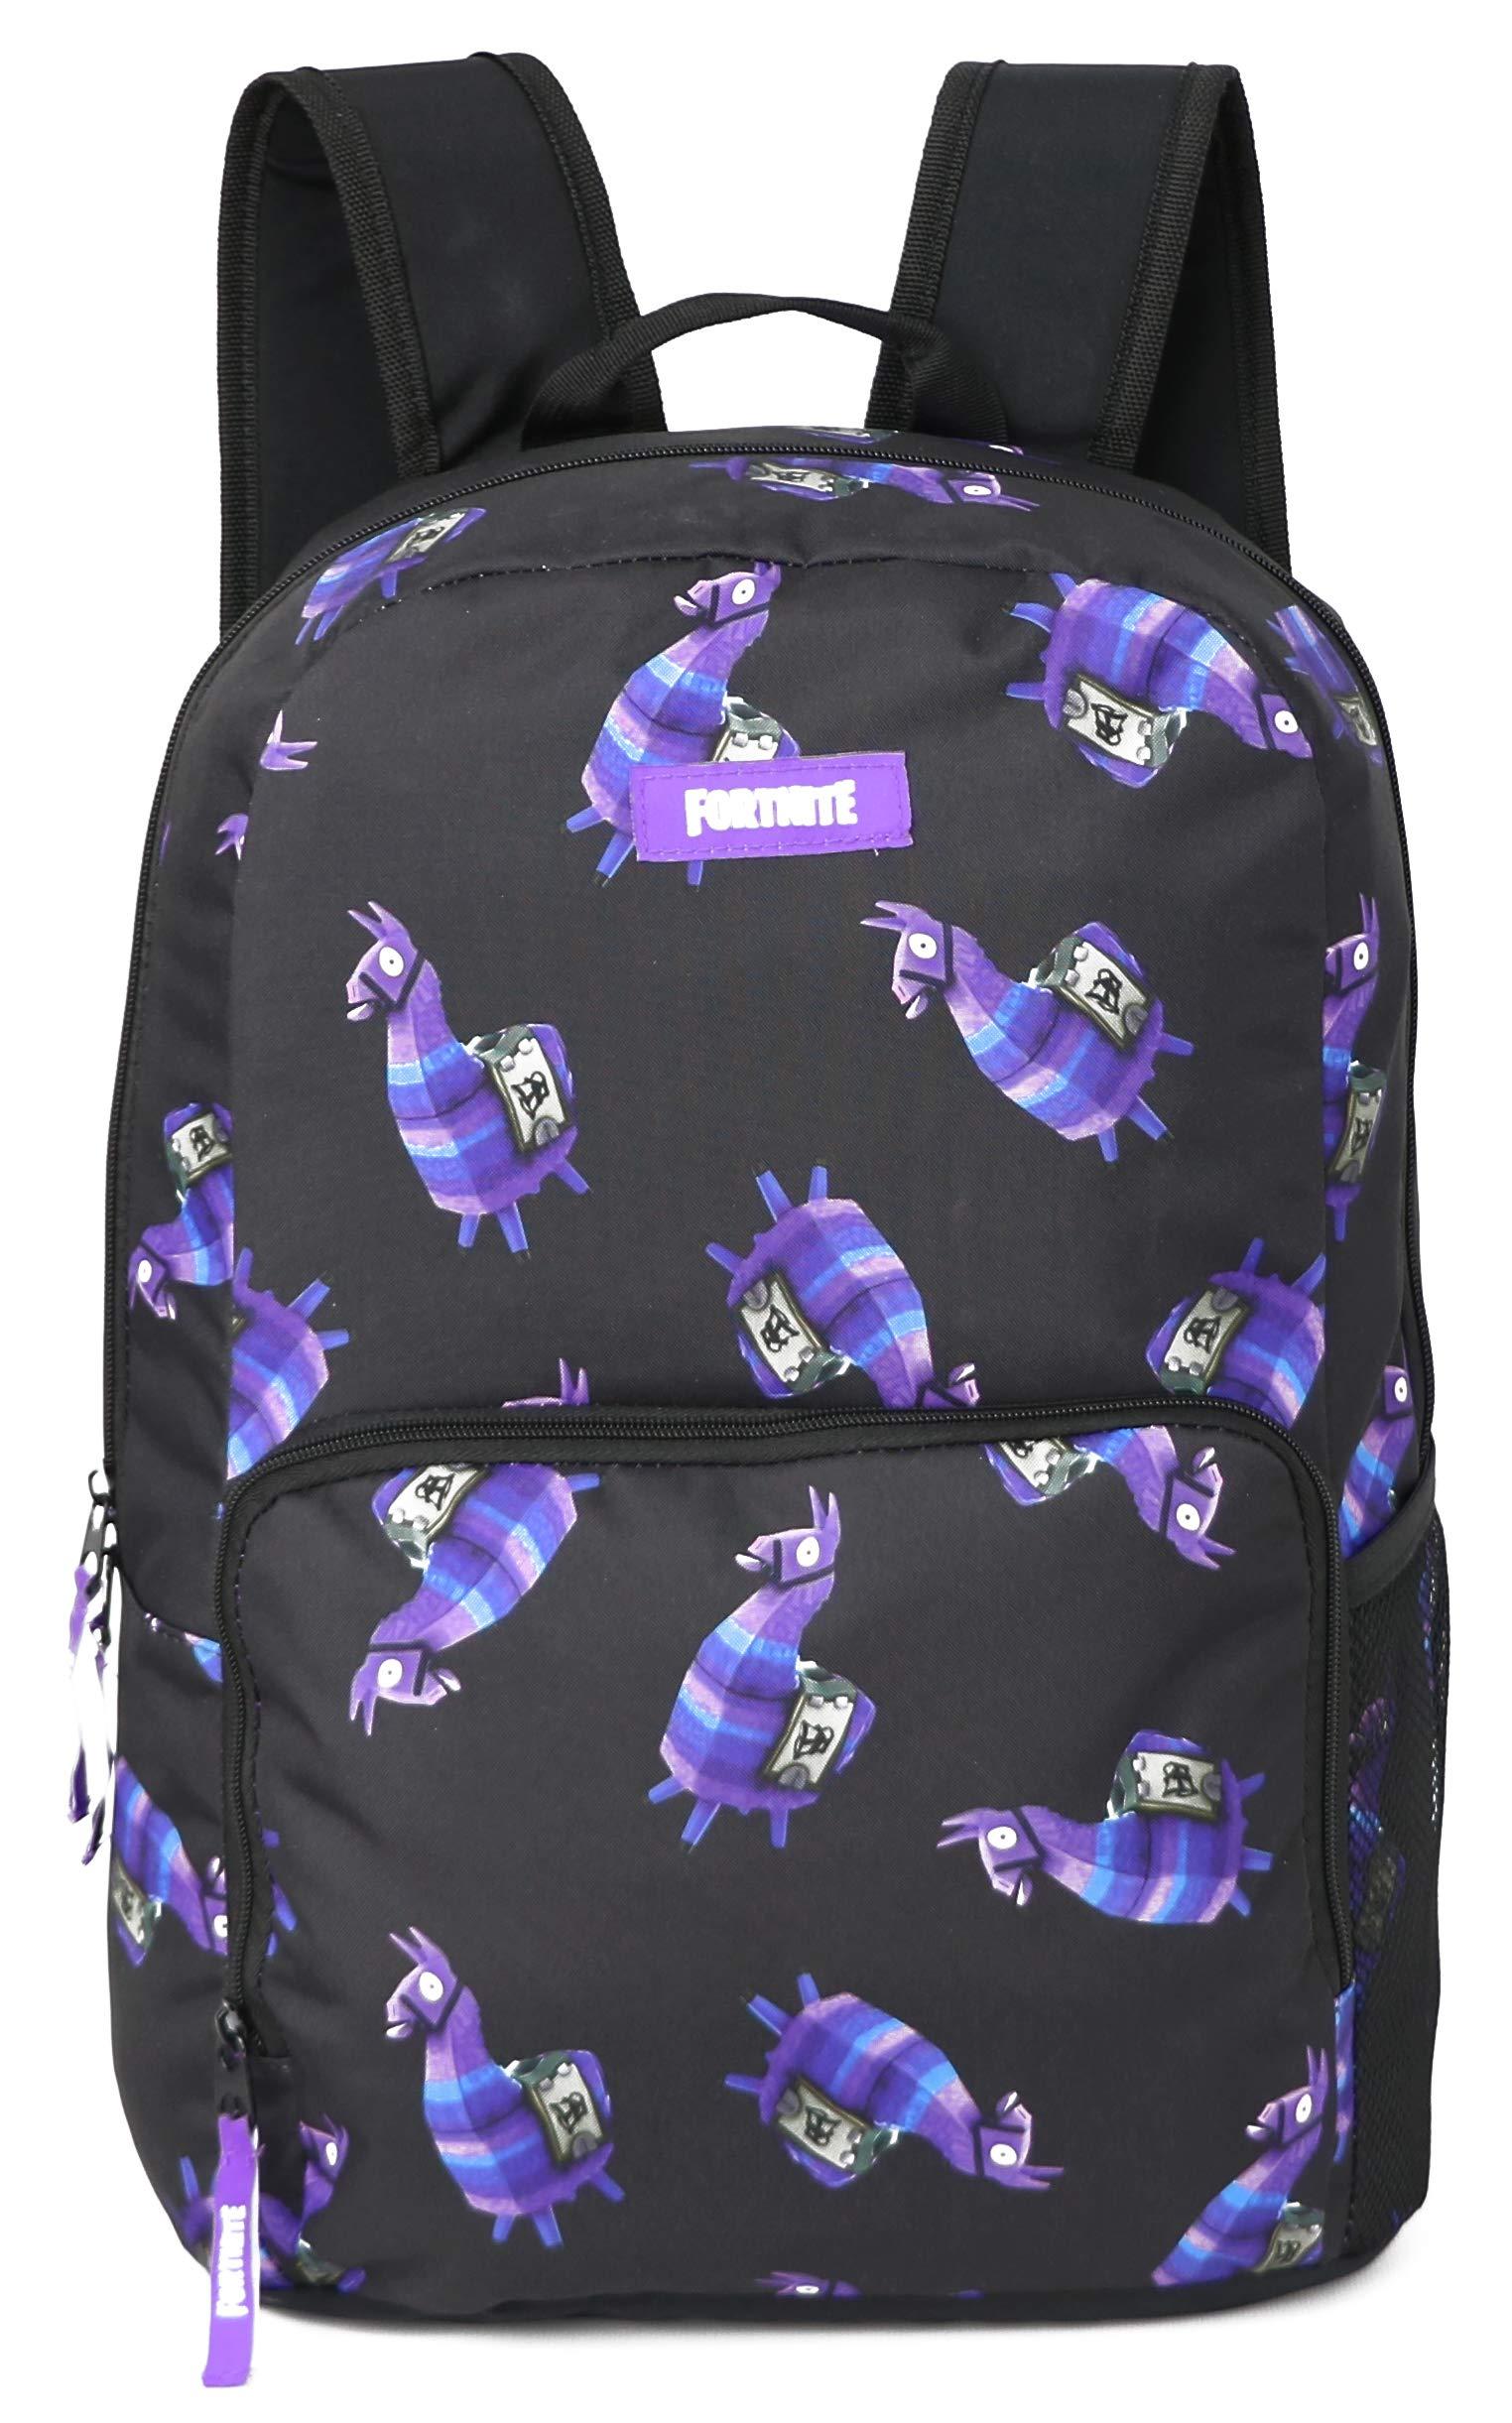 FORTNITE Kids' Little Amplify Backpack, black Combo, Youth Size